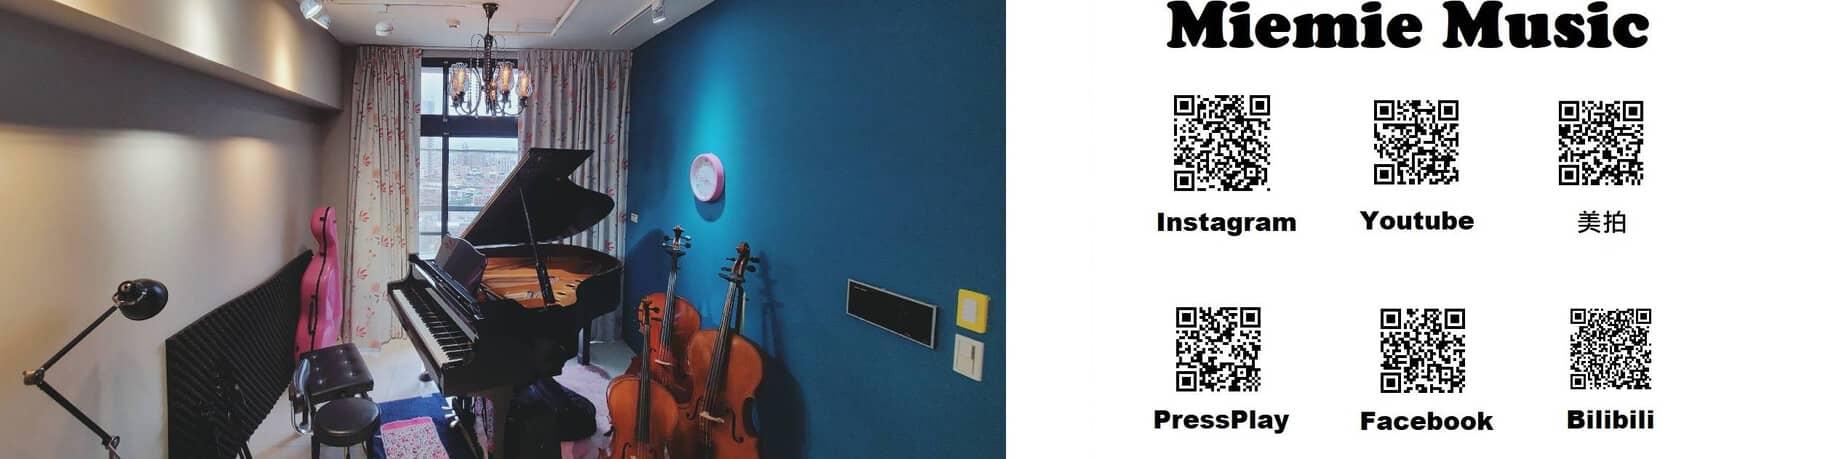 Miemie 音樂頻道: 大提琴與鋼琴的美麗碰撞